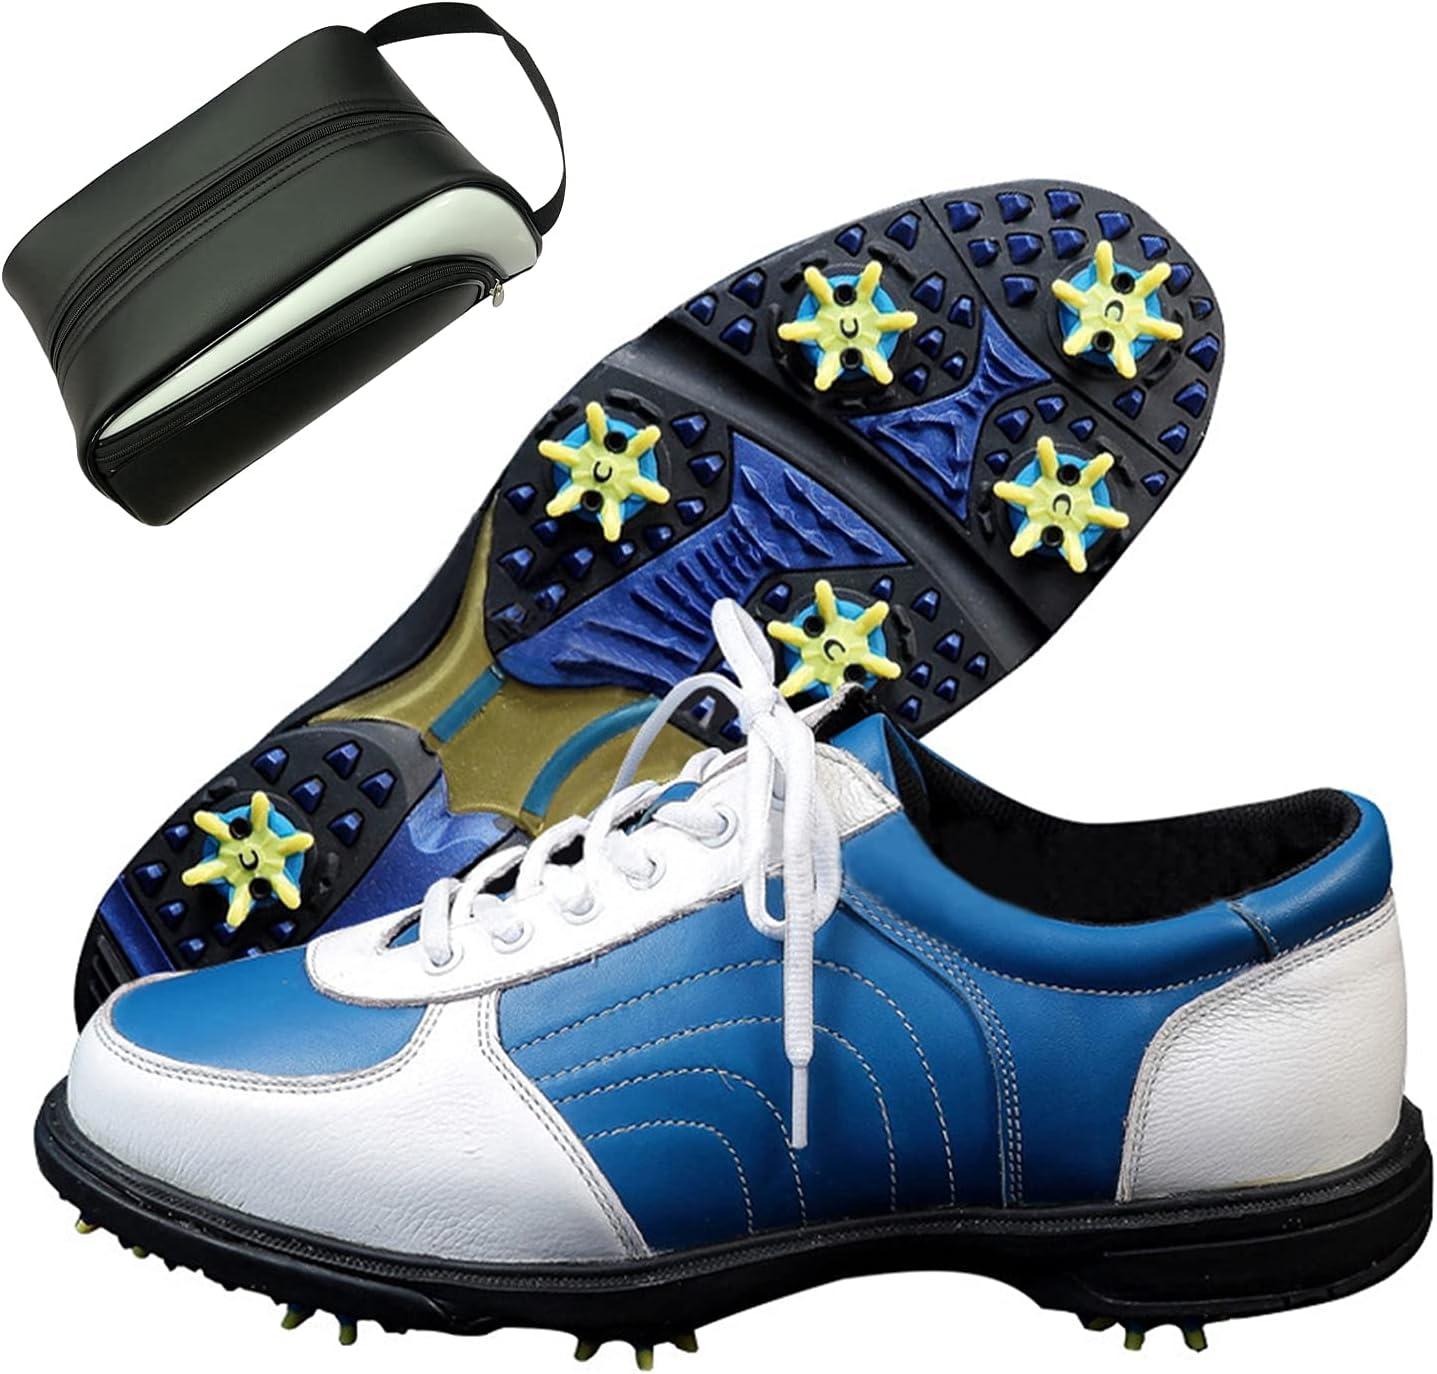 CAMILYIN Unisex First Layer Cowhide Golf Regular dealer w Super intense SALE Soft Shoe Shoes